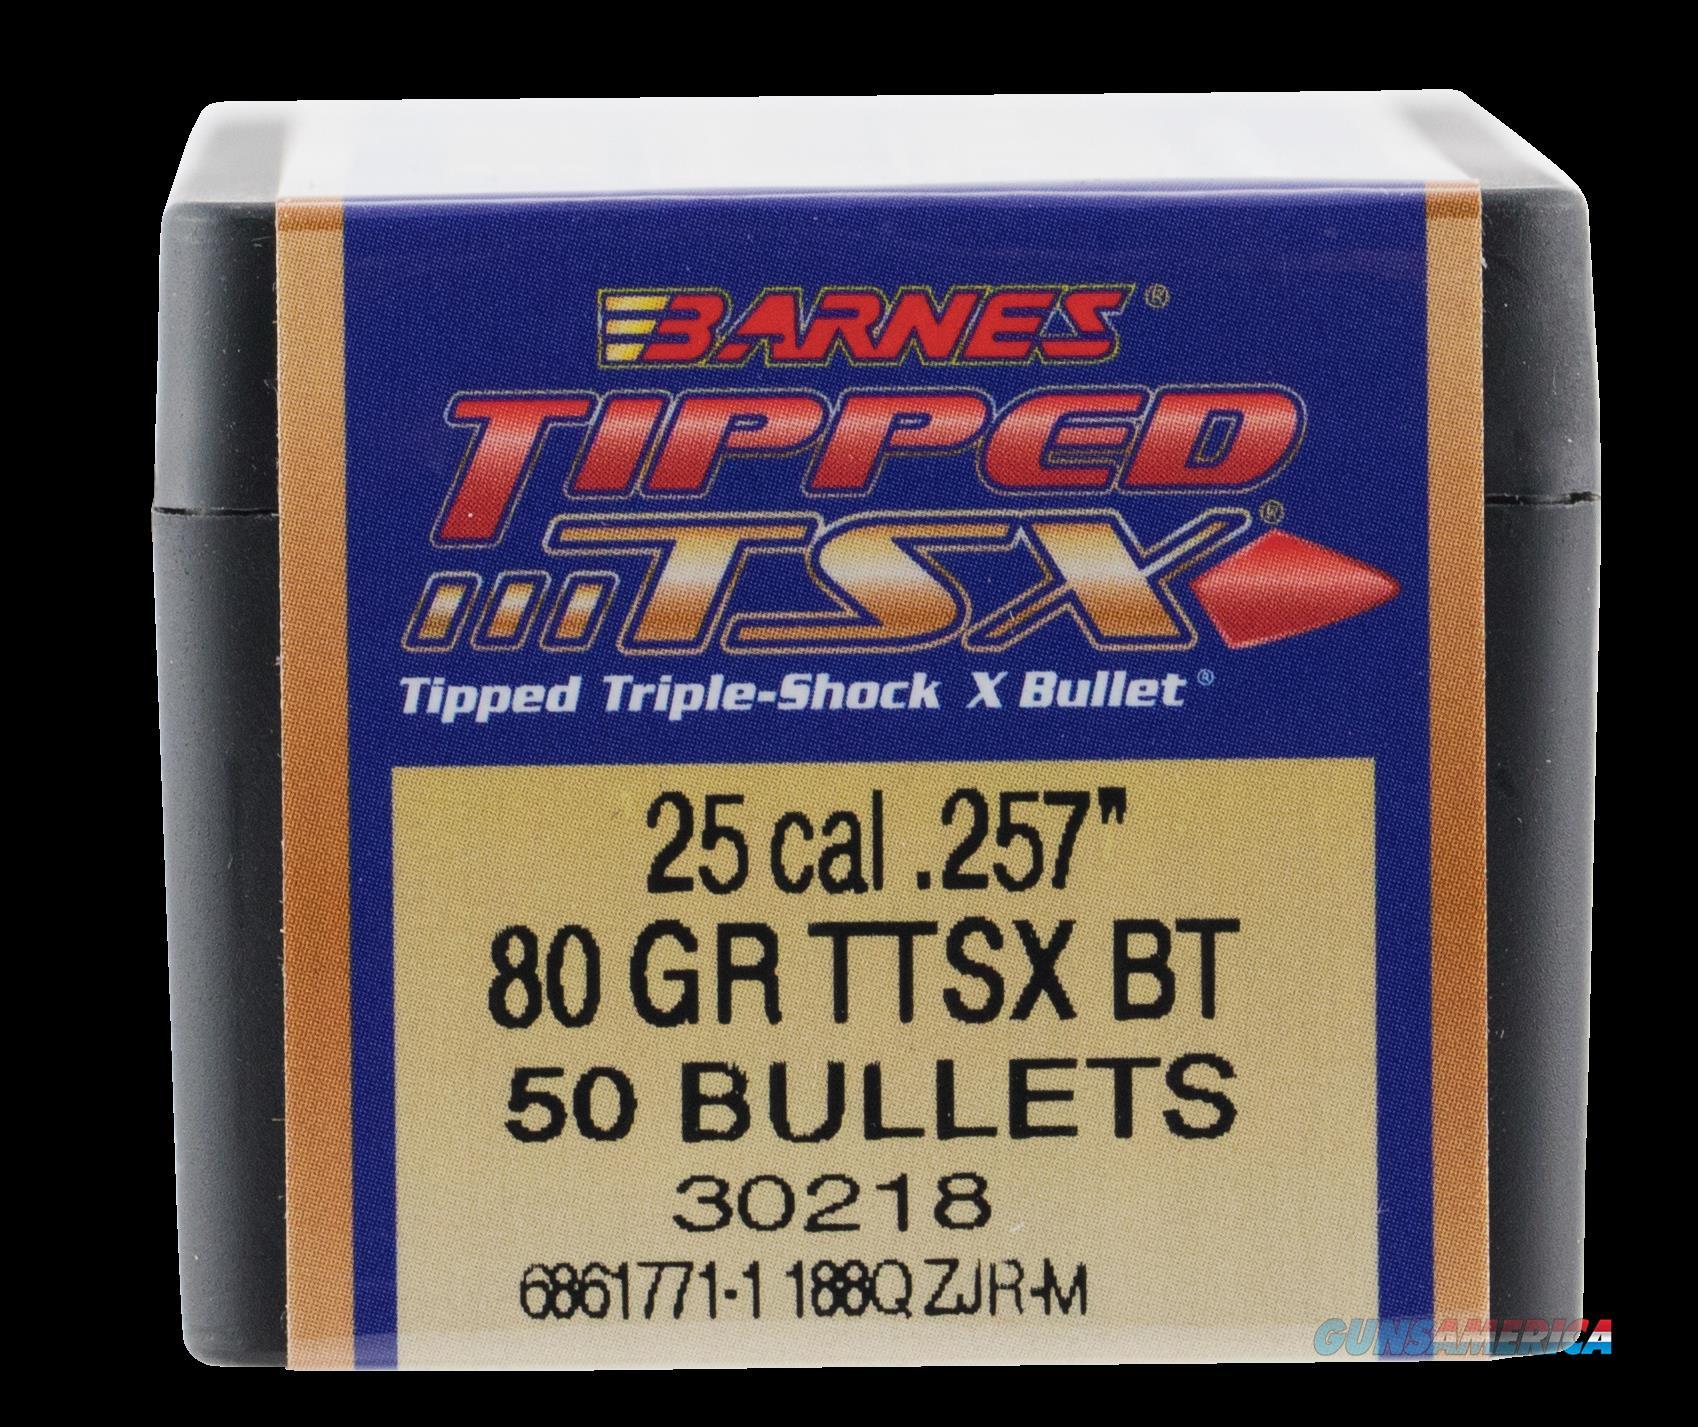 Barnes Bullets Tipped Tsx, Brns 30218 .257  80 Tipped Tsx Bt   50  Guns > Pistols > 1911 Pistol Copies (non-Colt)